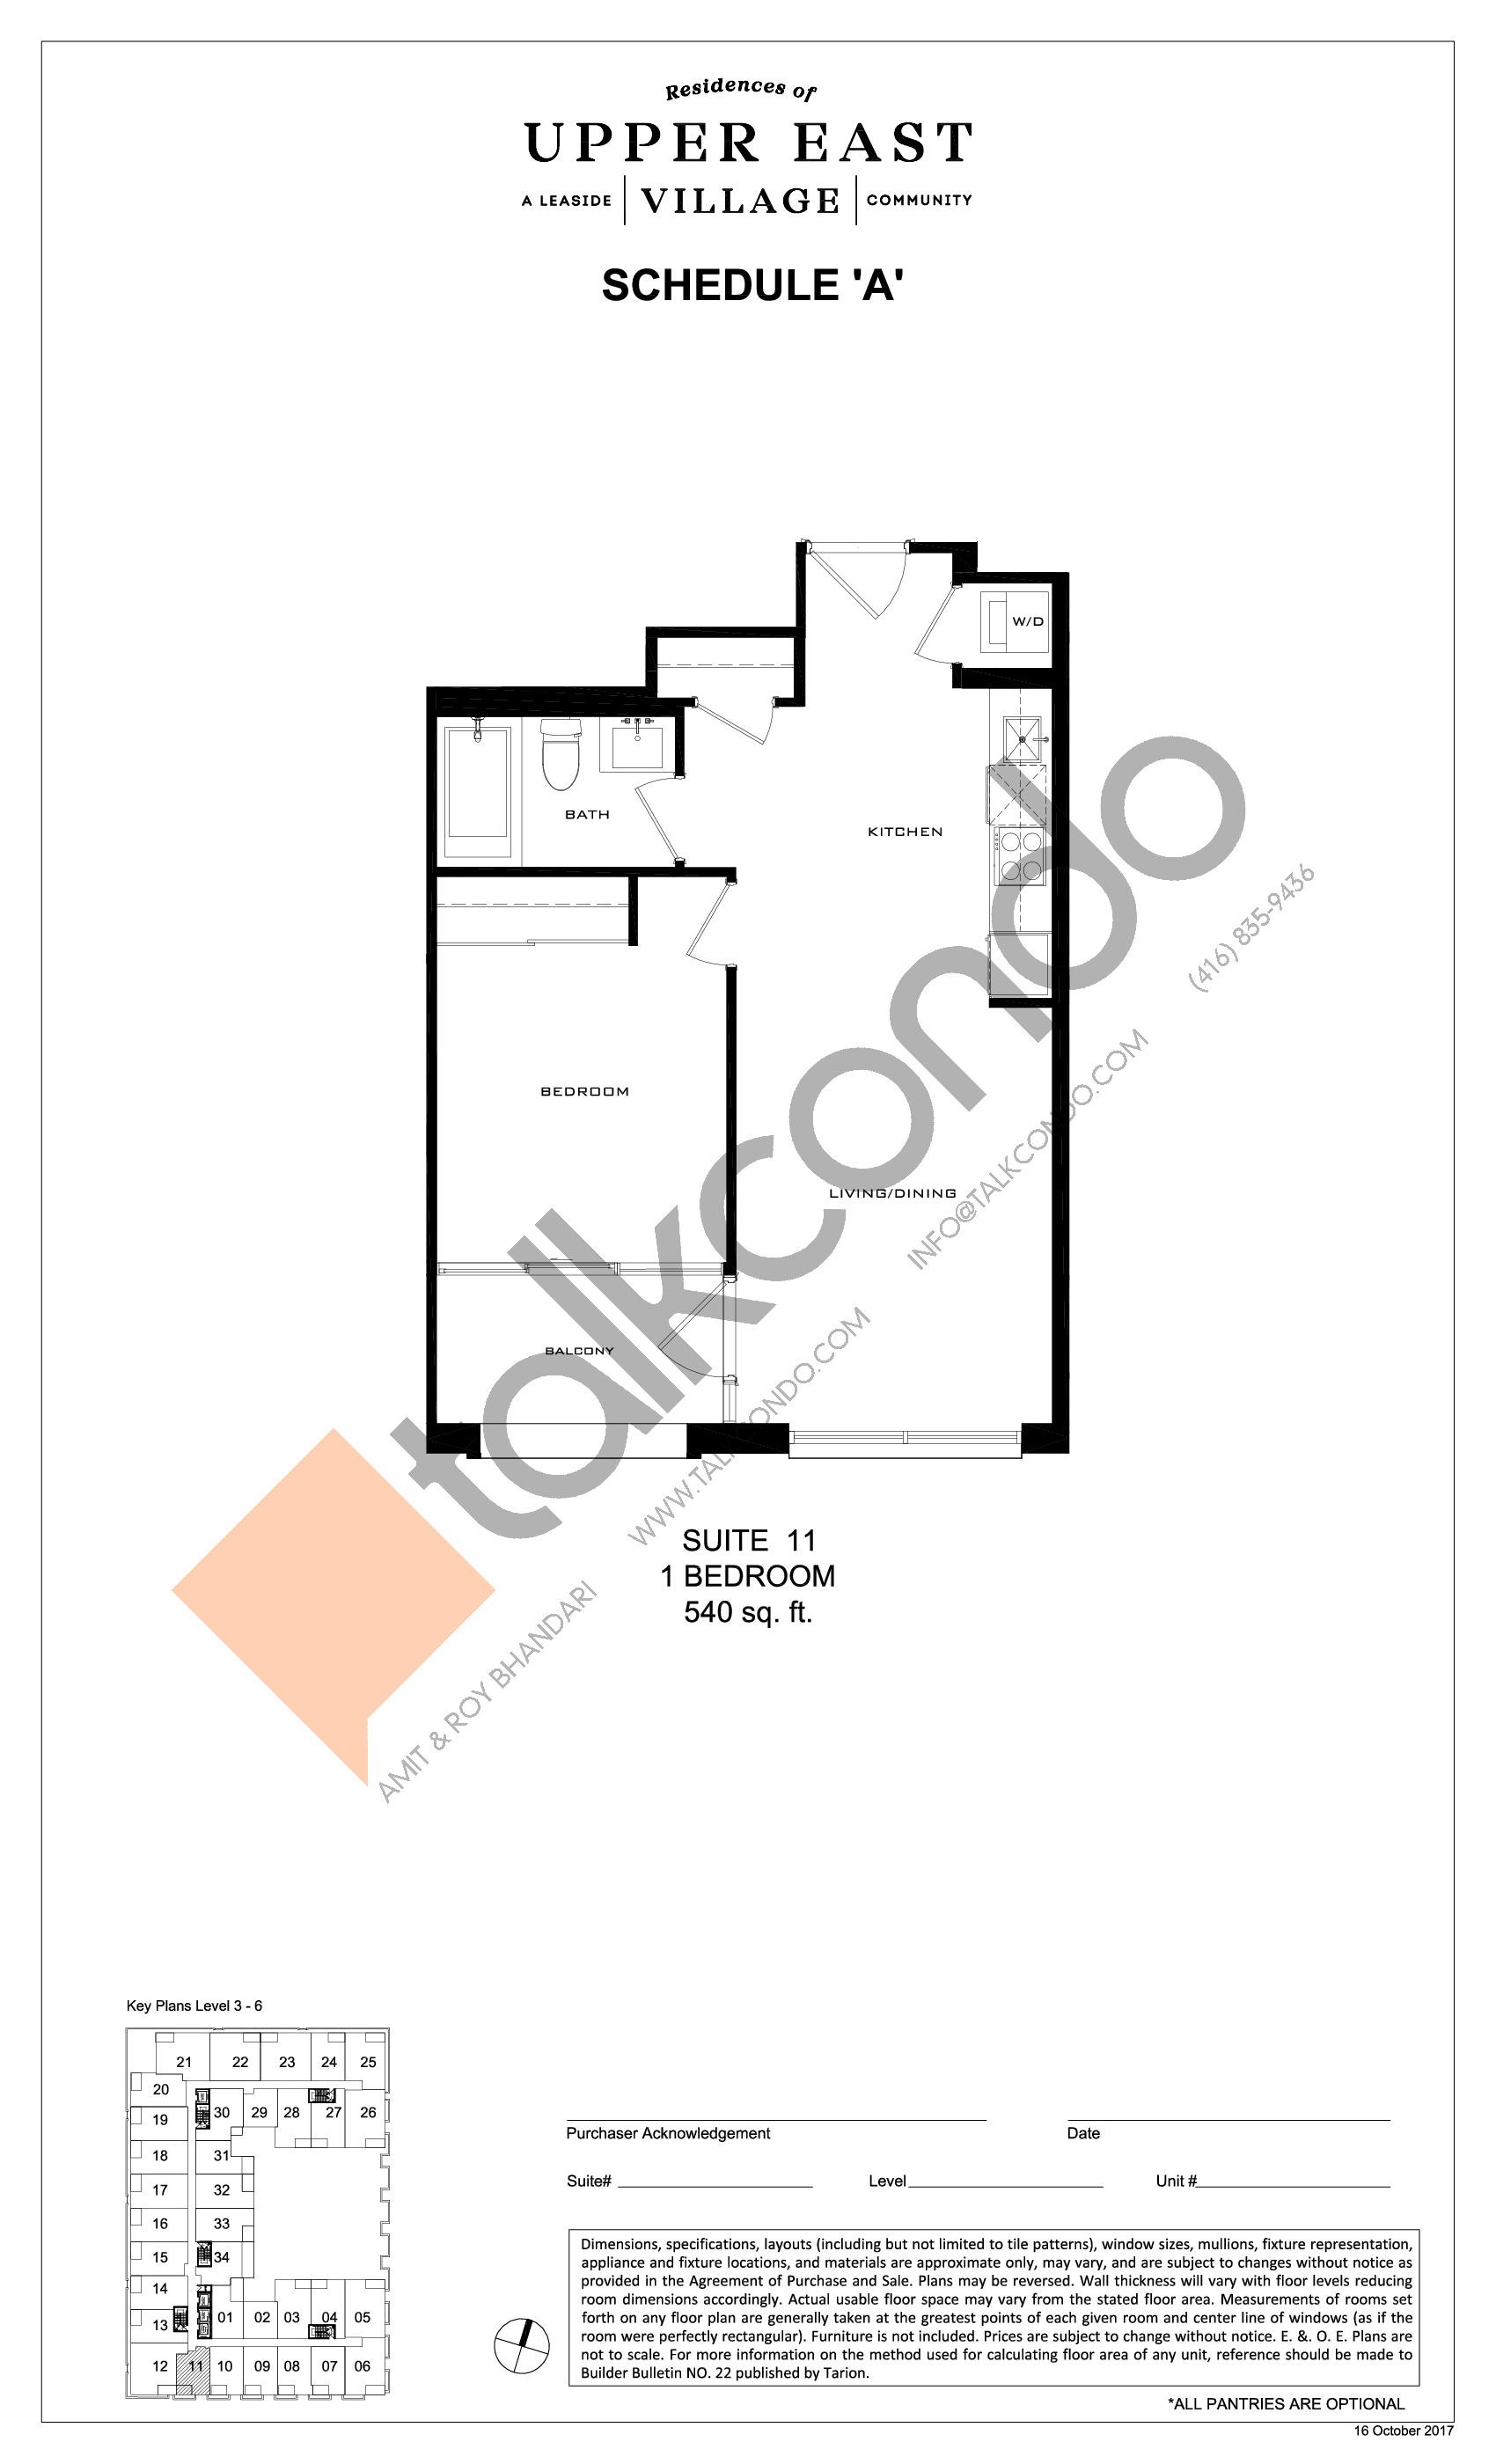 Suite 11 Floor Plan at Upper East Village Condos - 540 sq.ft